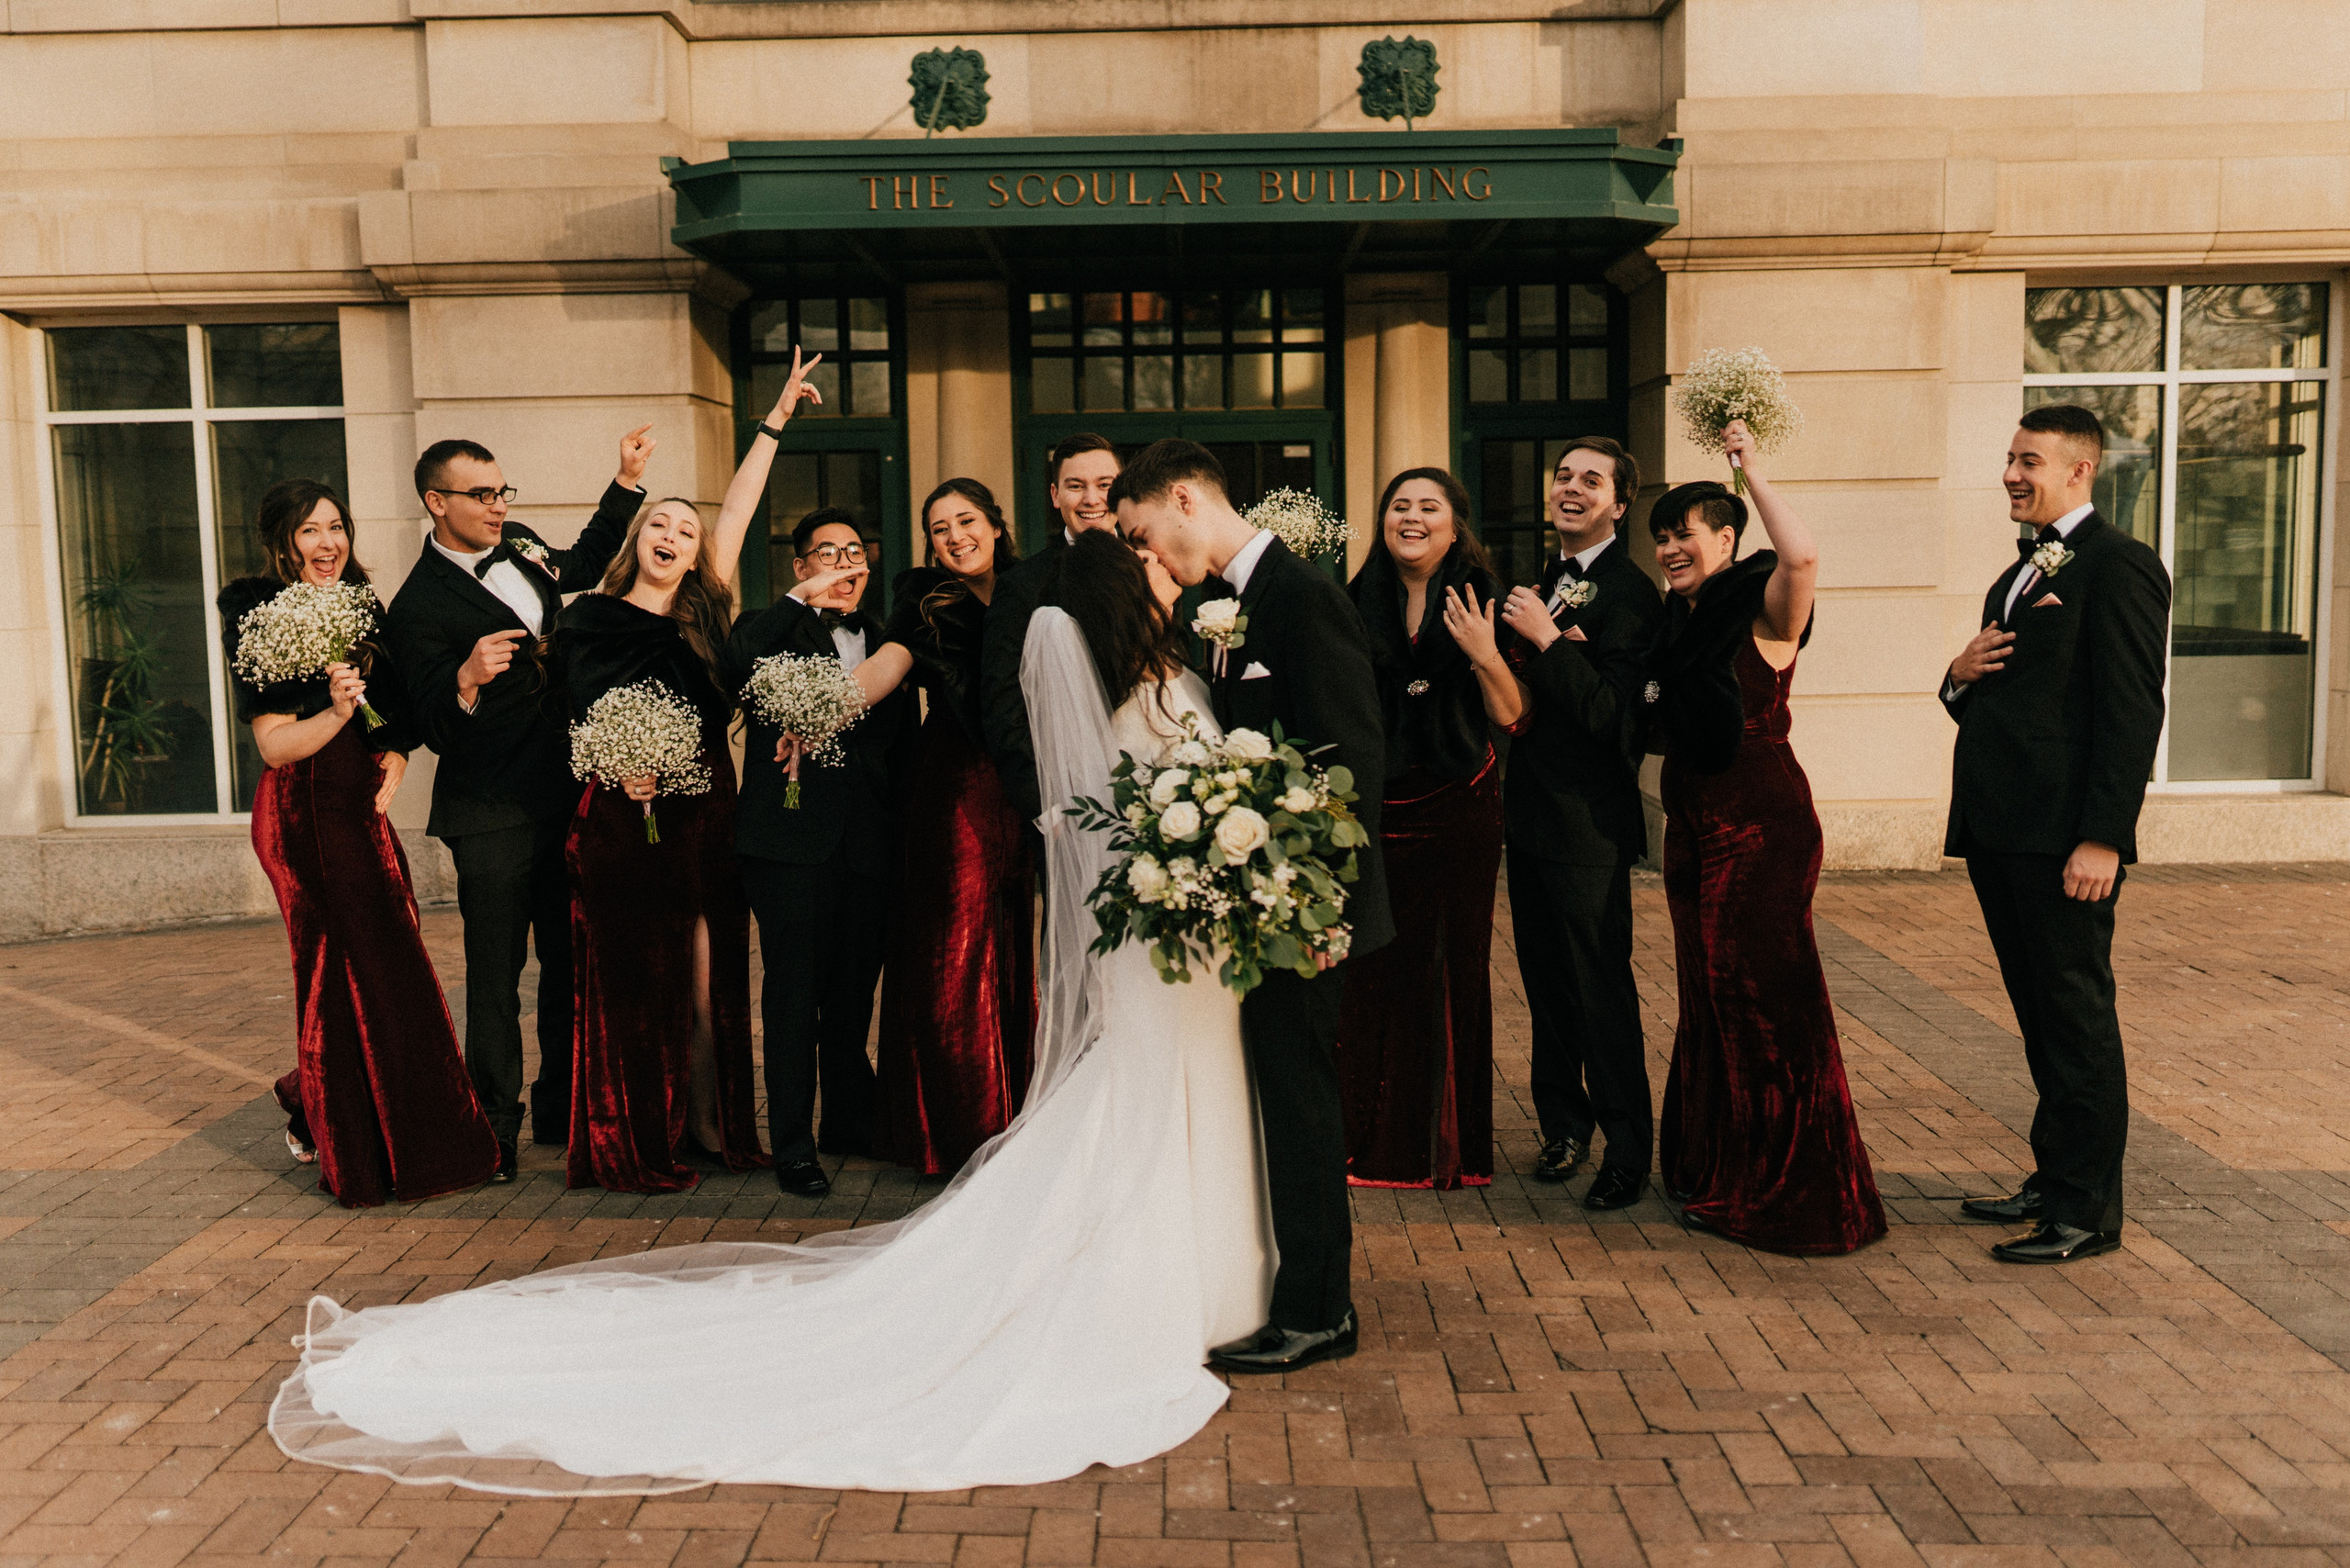 omaha wedding at scoular ballroom